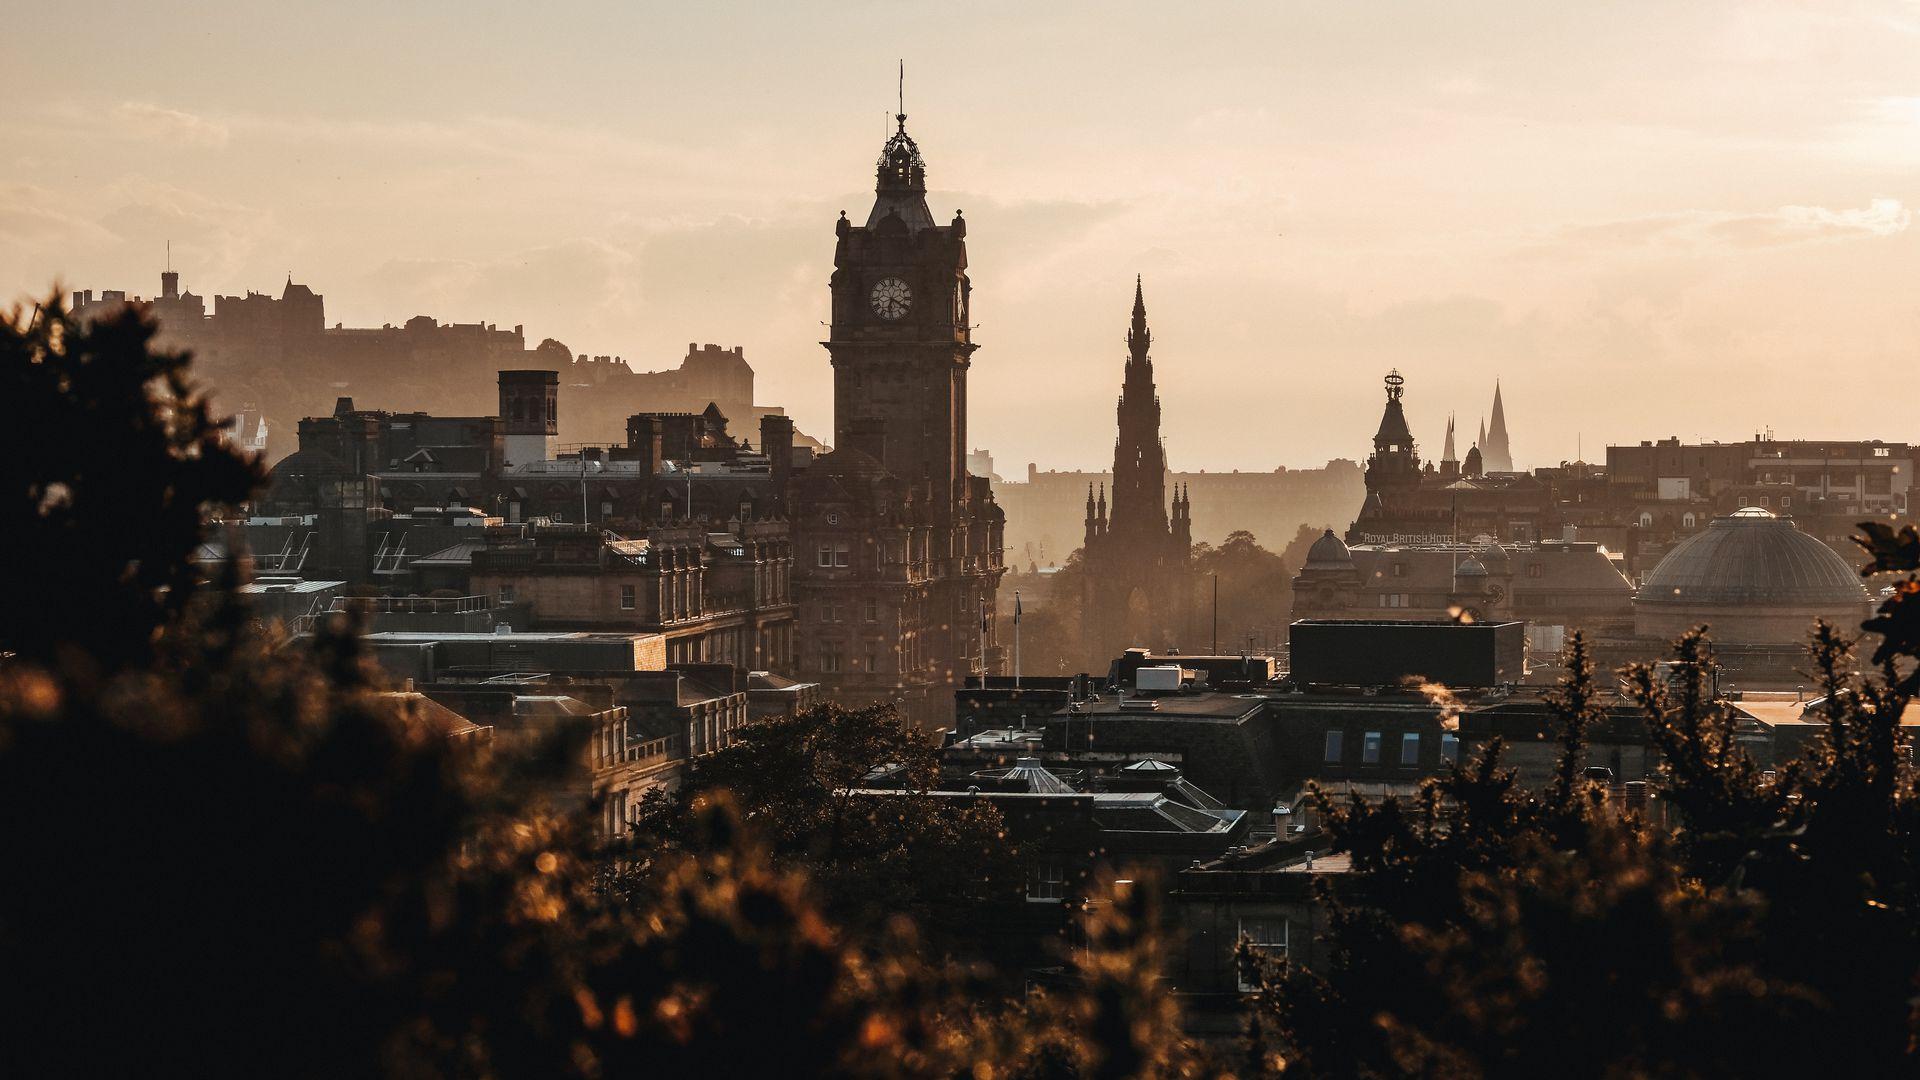 Edinburgh: Harry Potter-Themed Tour & Audio Guide